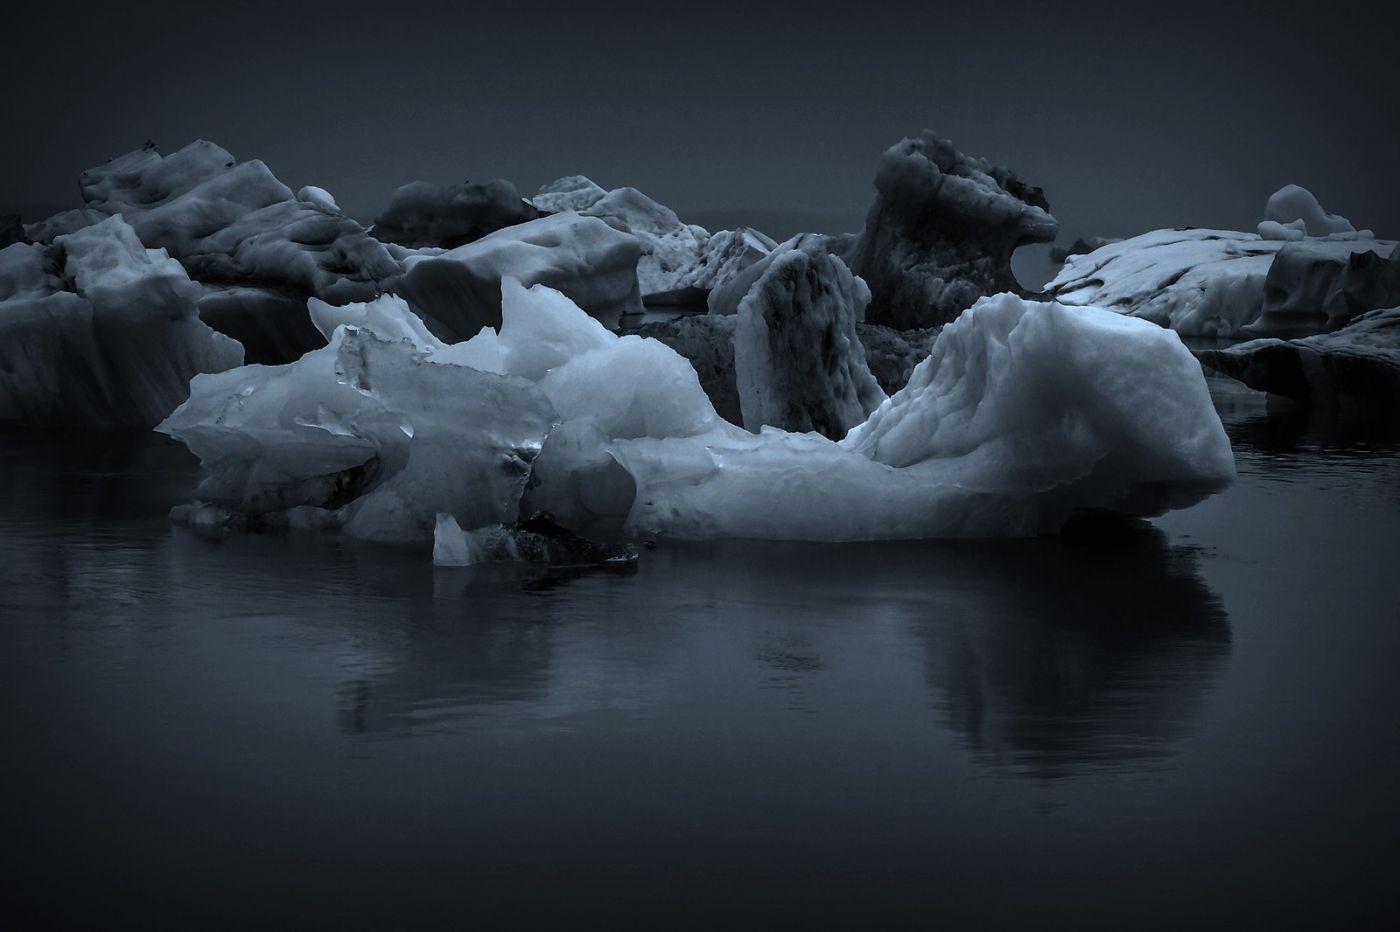 冰岛冰川泻湖(Glacier Lagoon),流动的冰川_图1-25